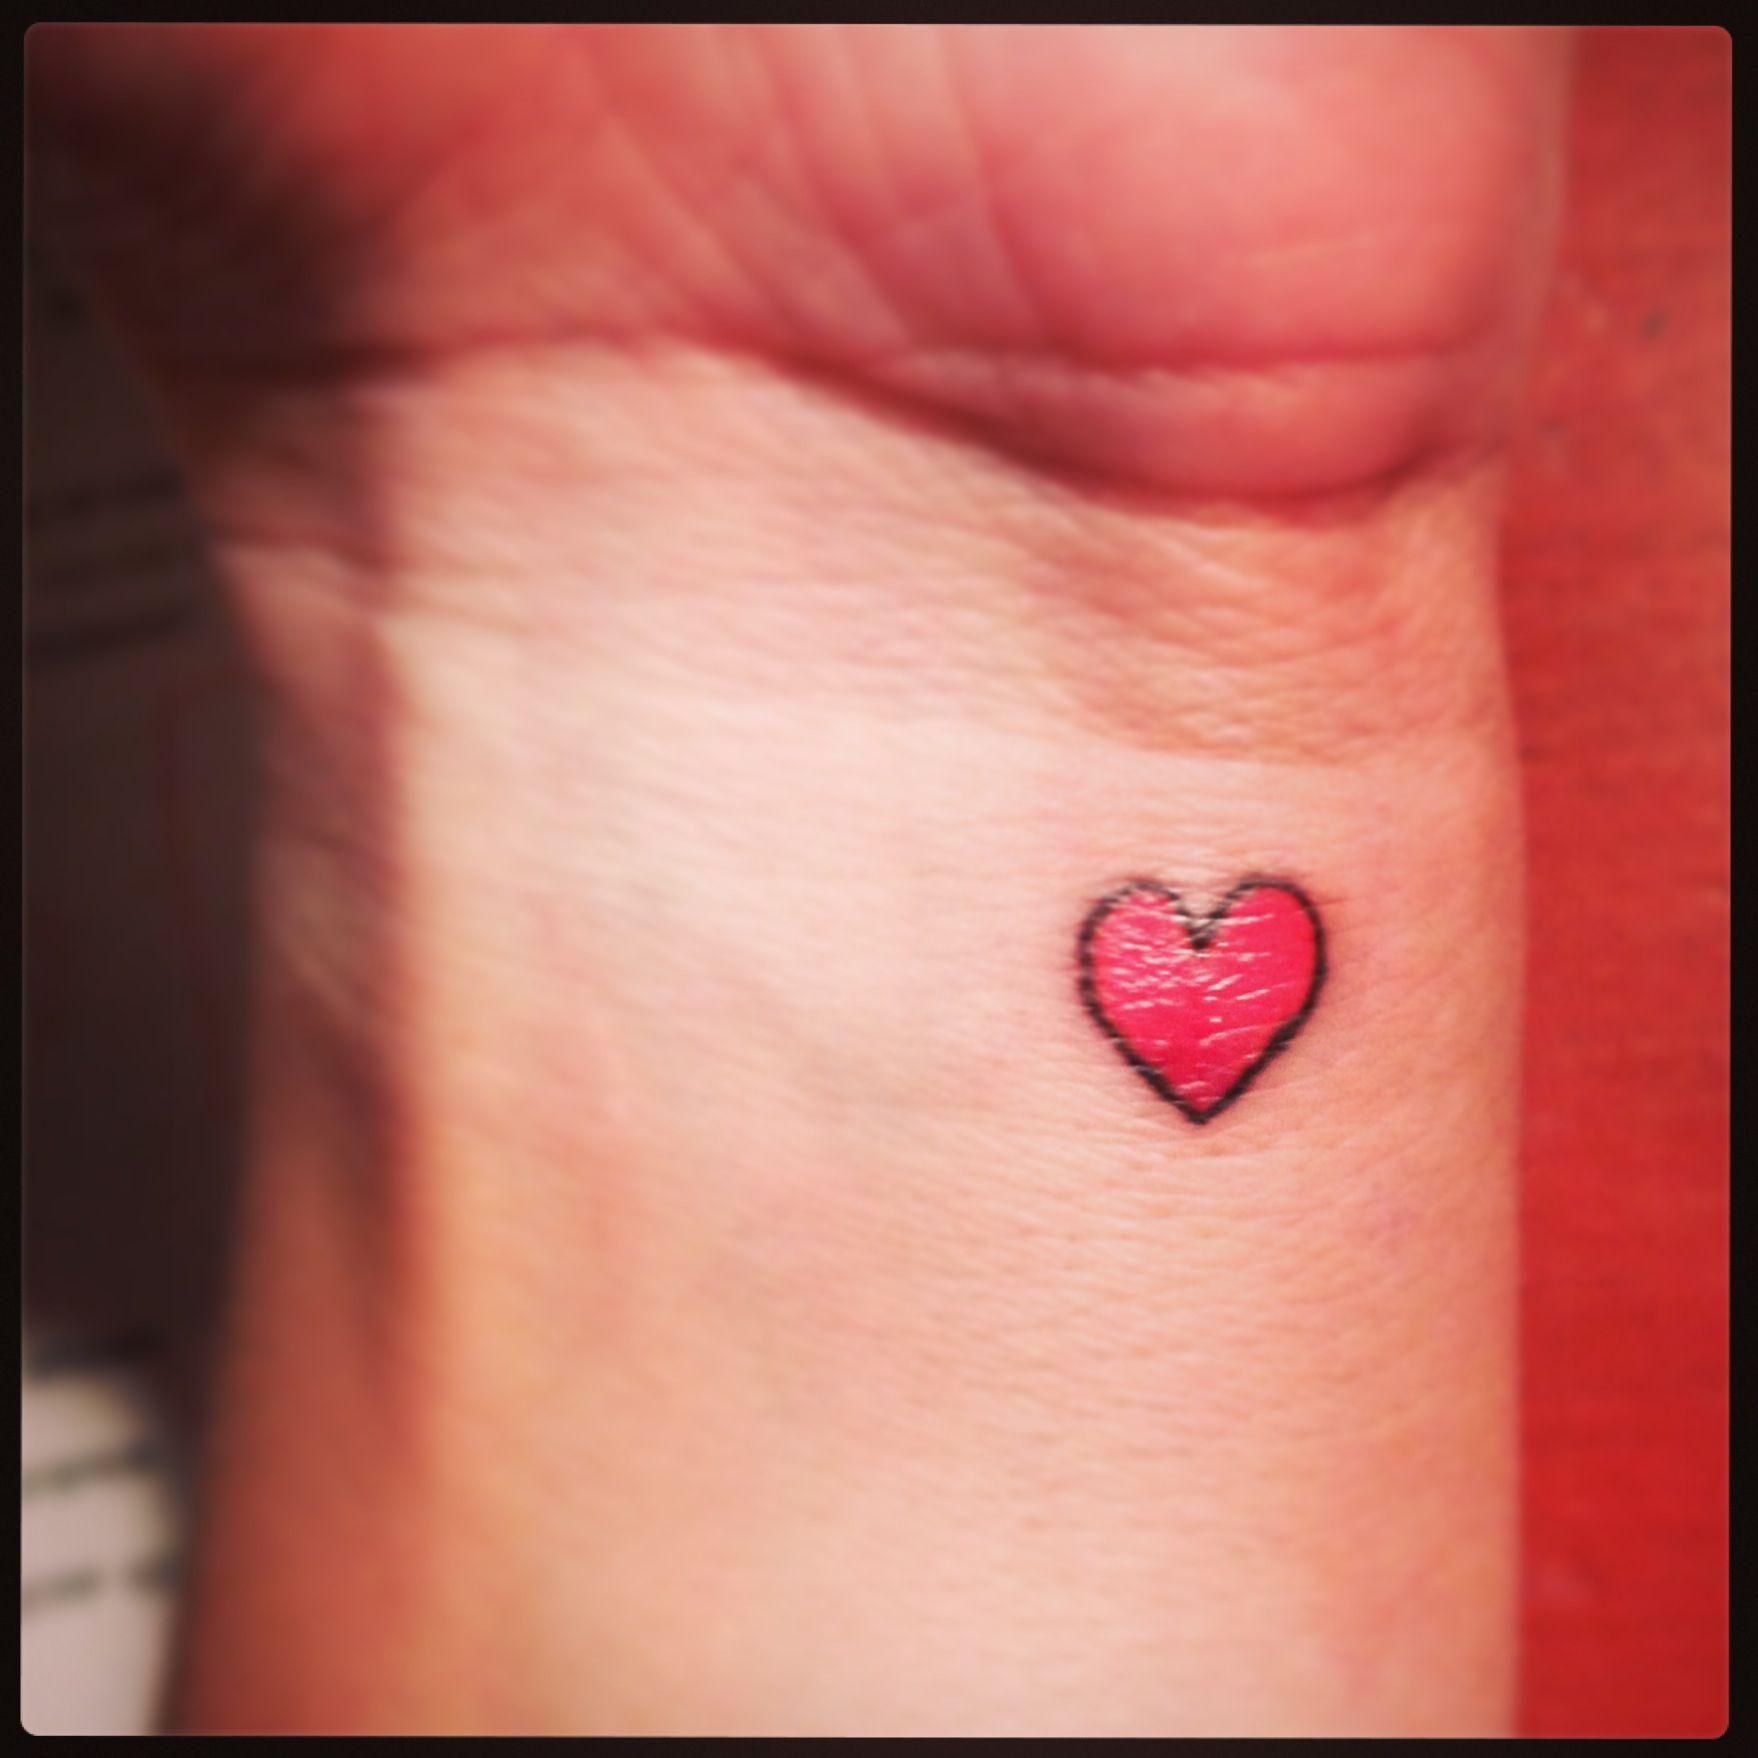 Tiny heart wrist tattoo Tattoos Tiny heart tattoos